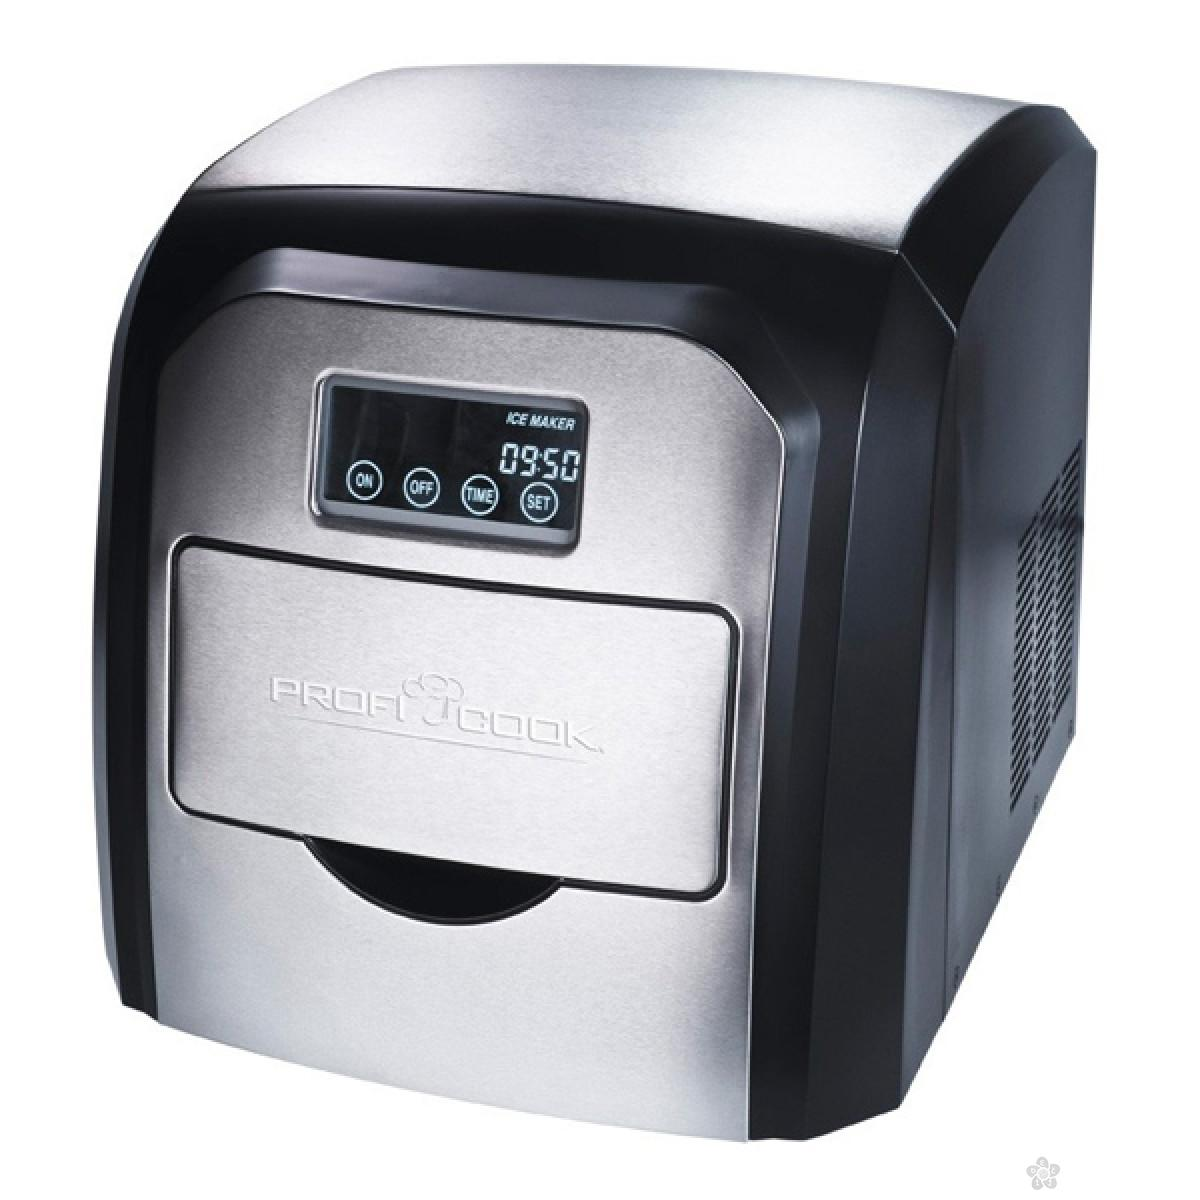 Ledomat Profi cook PC-EWB 1007